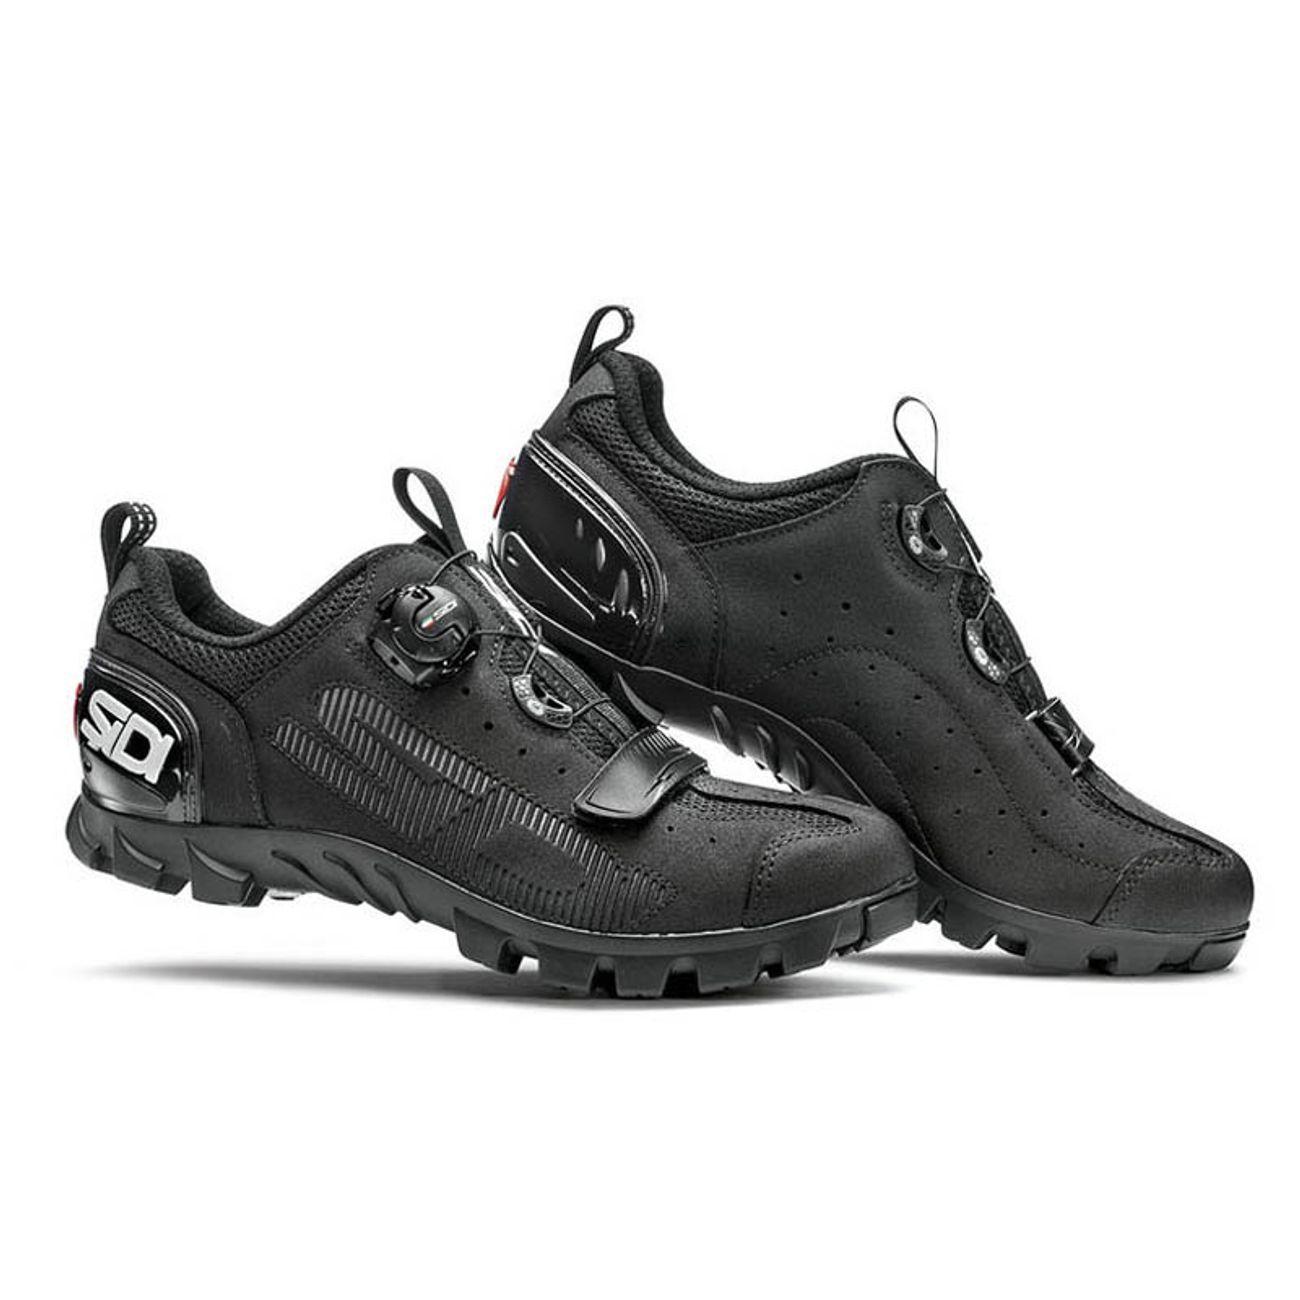 – Et Sport Prix Pas Sd15 Achat Cher Vtt Chaussures Go Sidi Noir 1wnPY01Ox